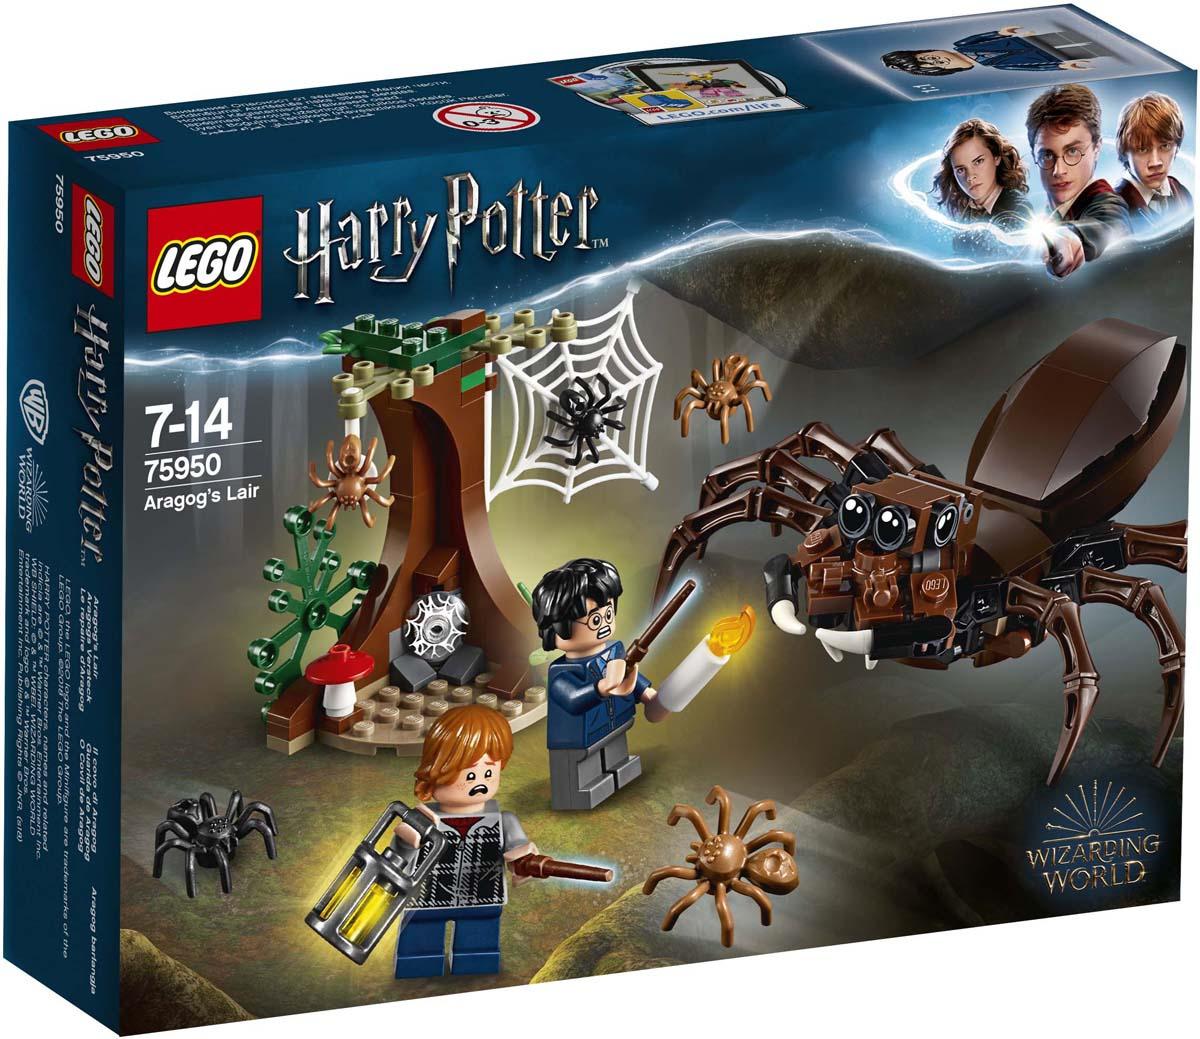 LEGO Пластиковый конструктор Harry Potter Логово Арагога lego harry potter years 1 4 [mac цифровая версия] цифровая версия